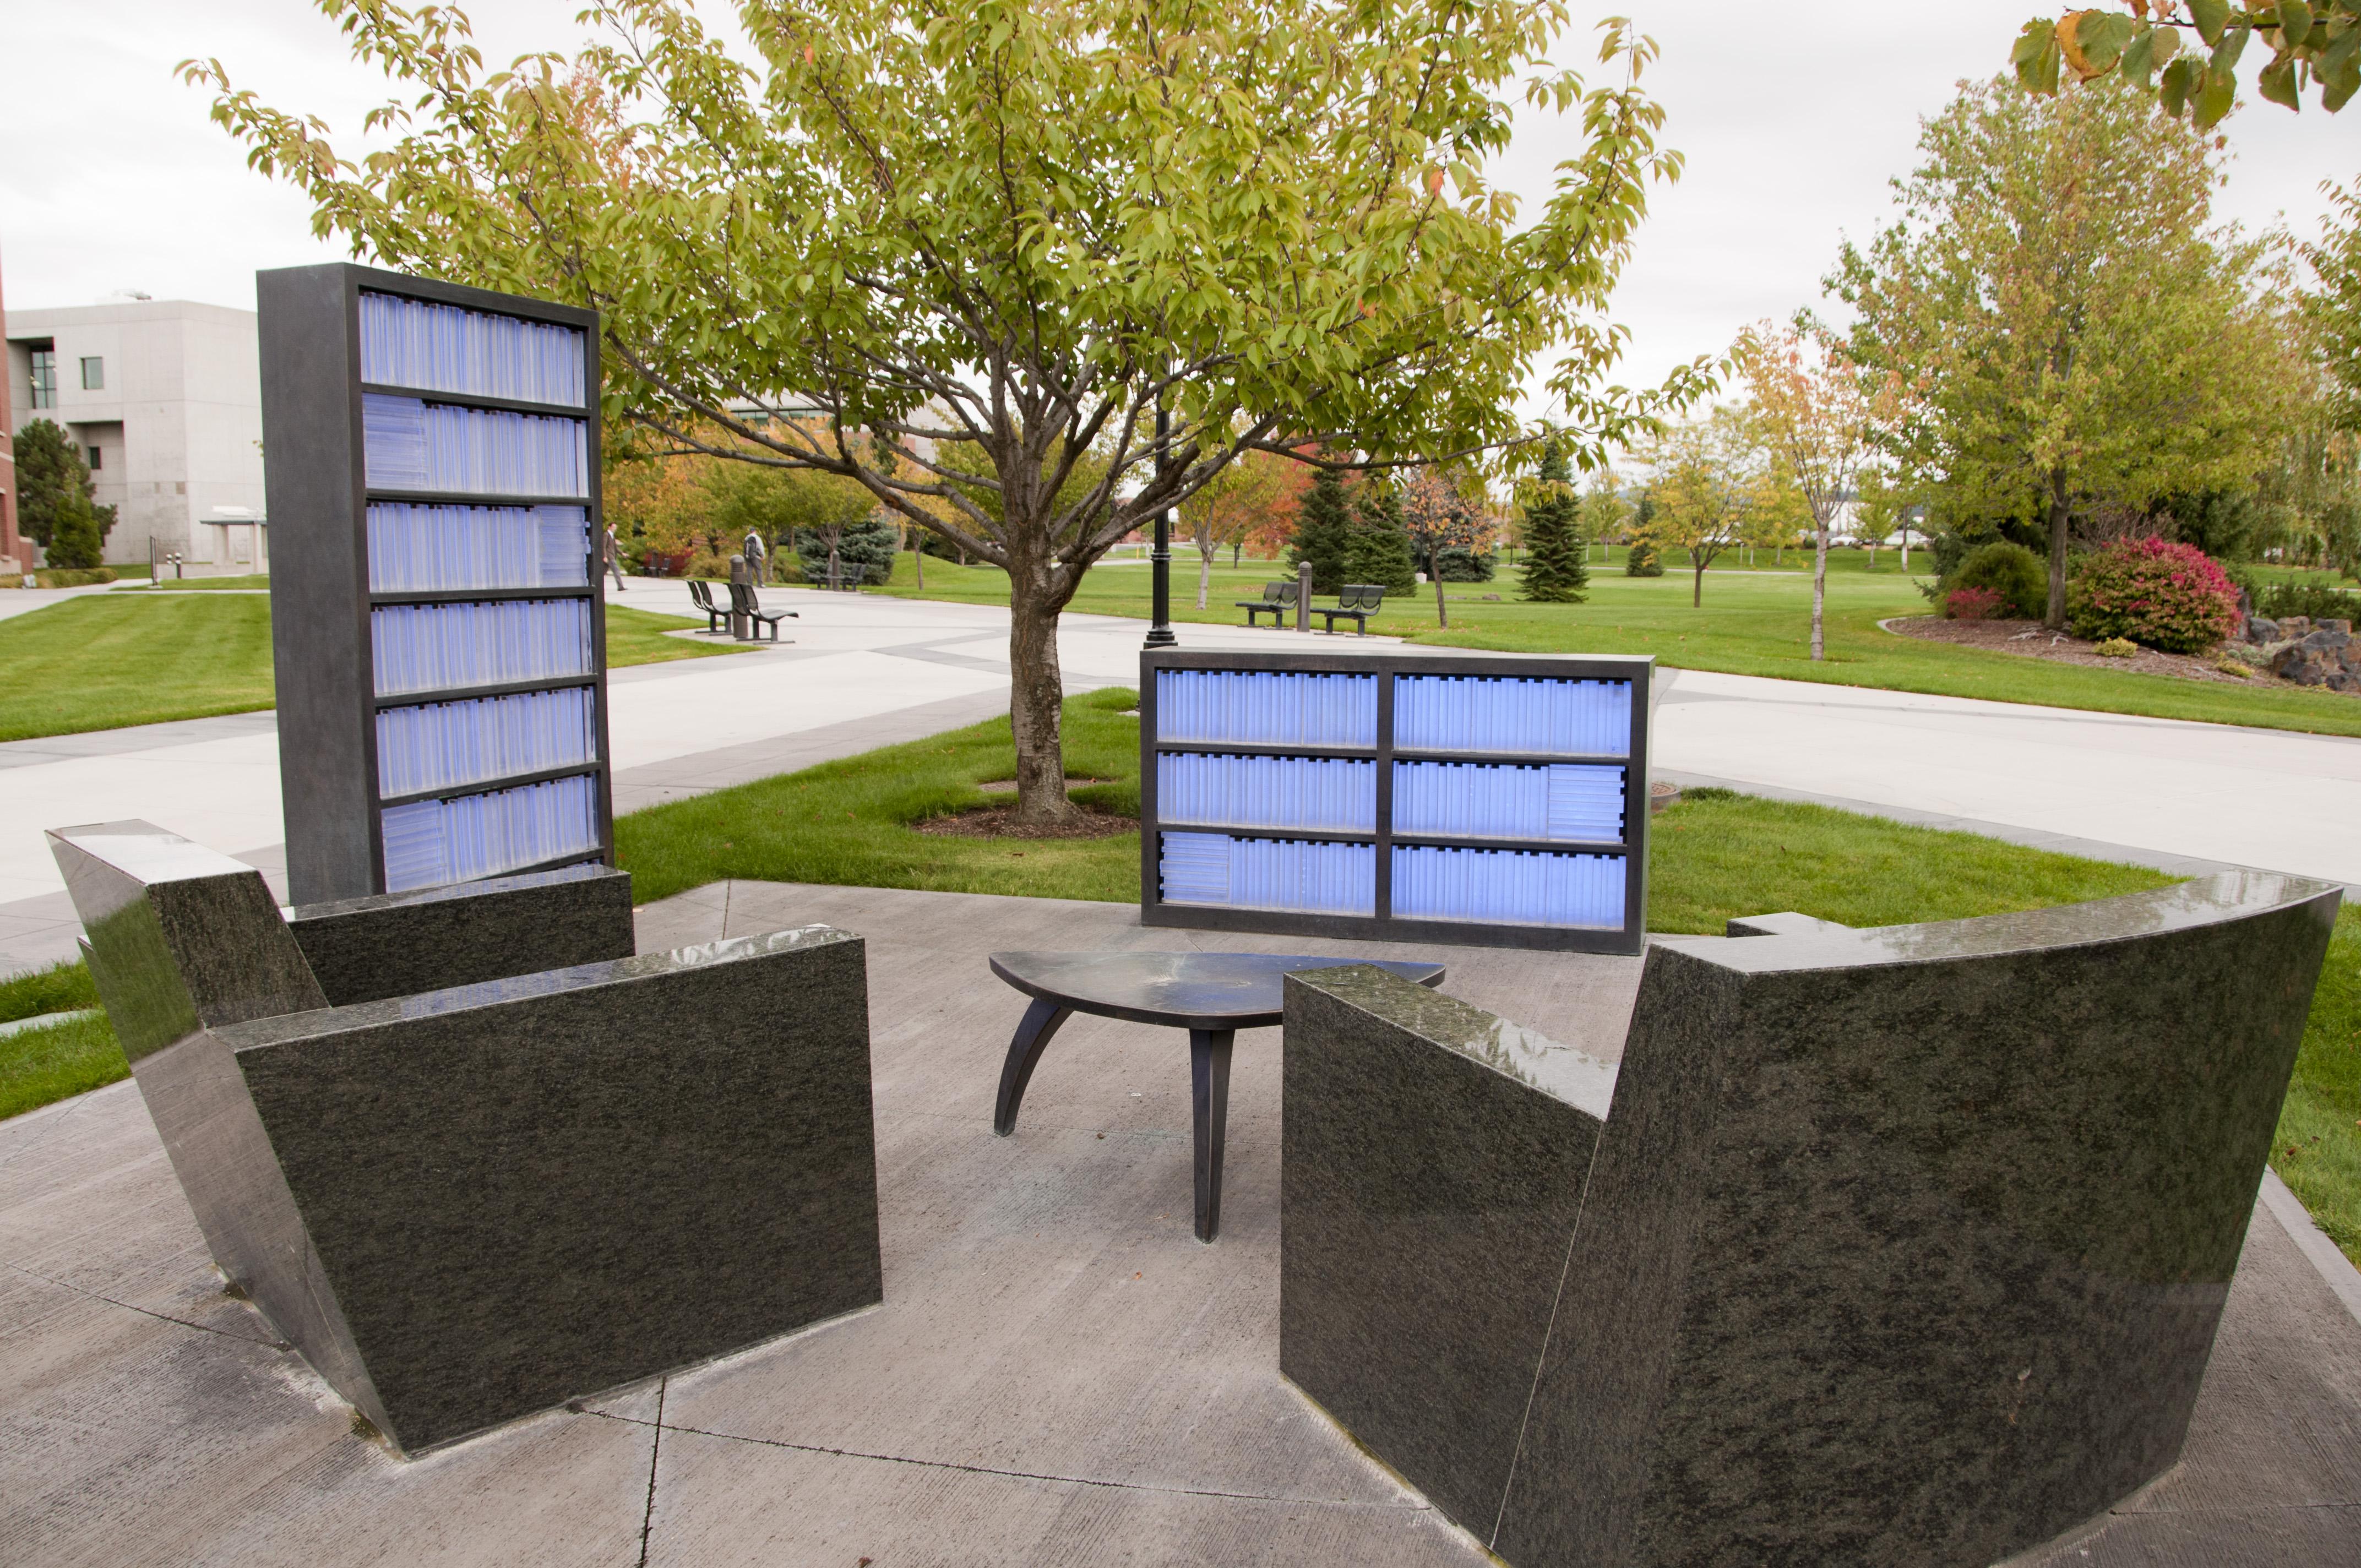 Buildings And Art About Wsu Spokane Washington State University